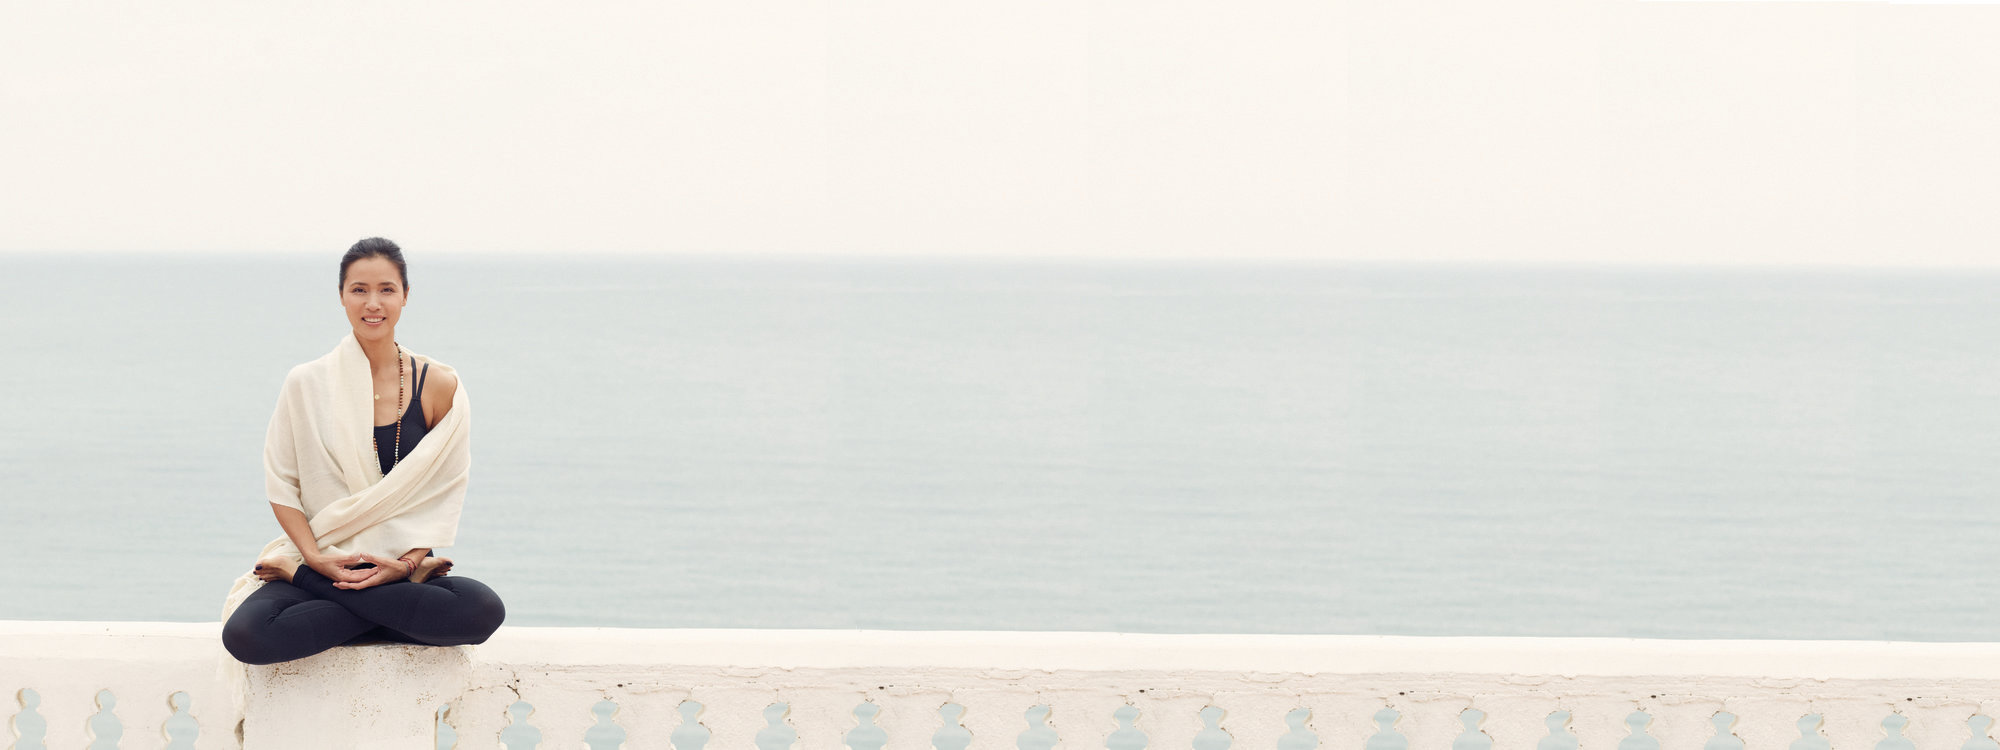 Xuan Lan - Yoga para mi bienestar